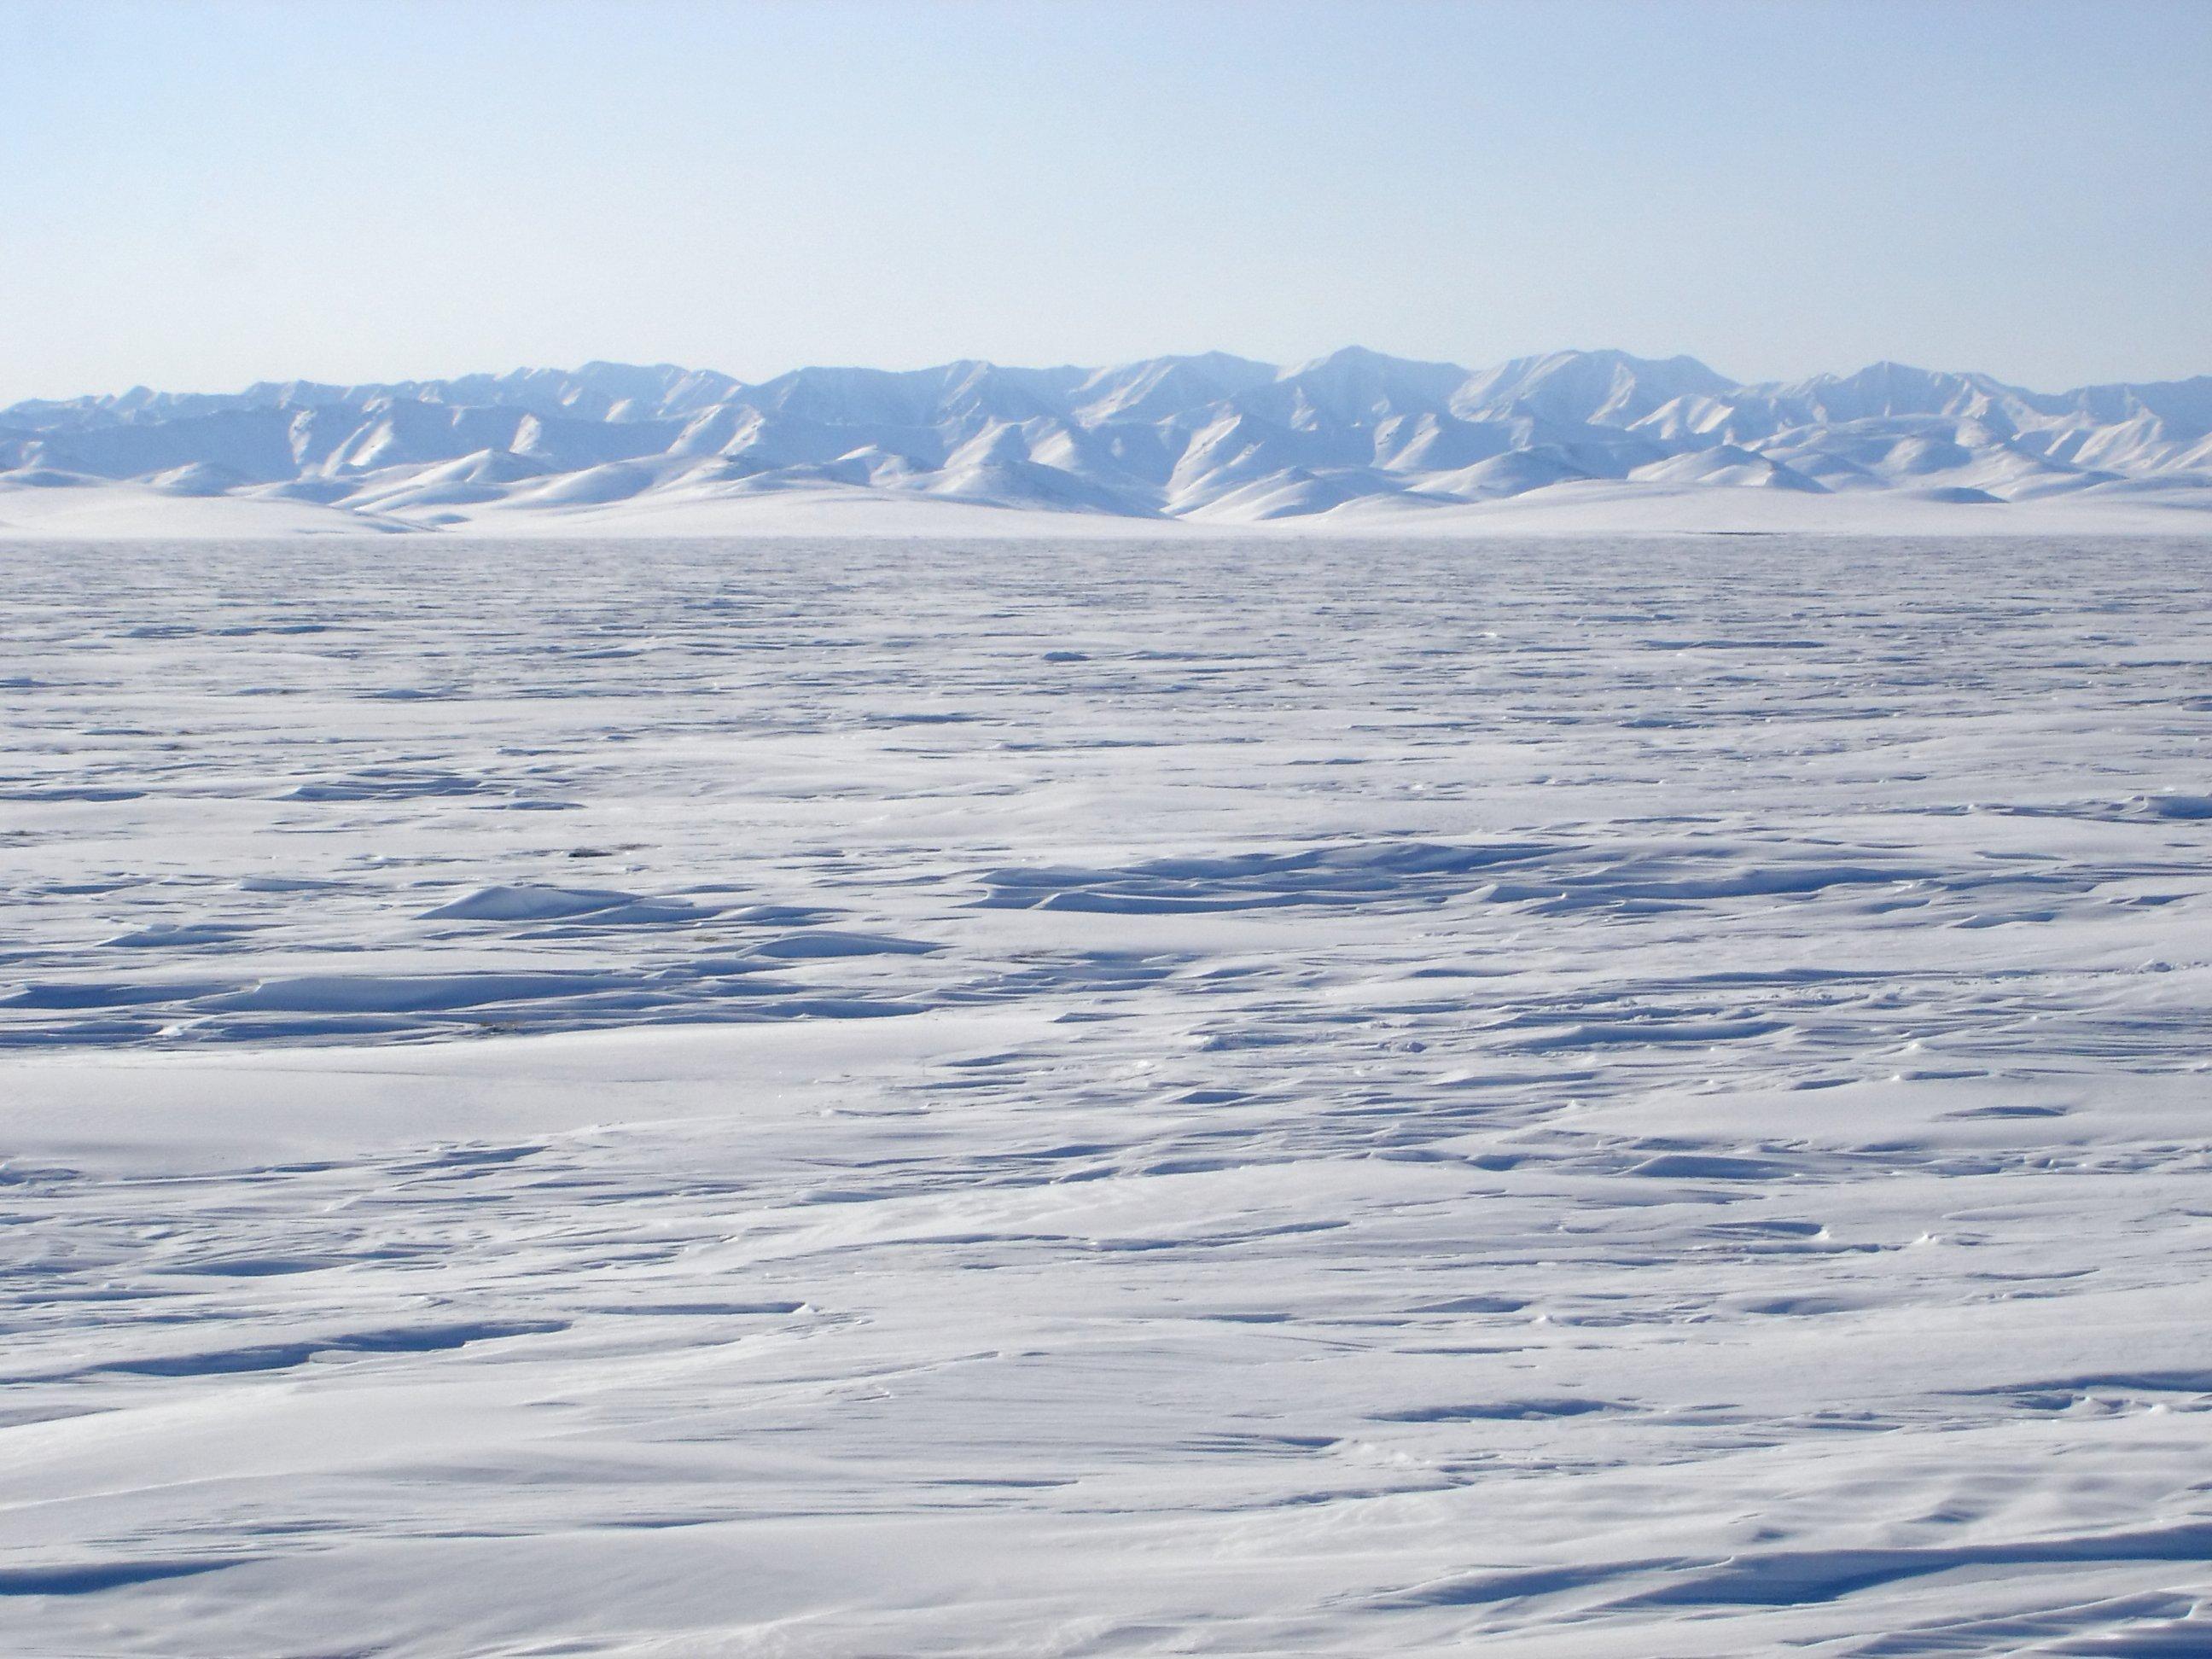 The Beaufort Sea via Shutterstock